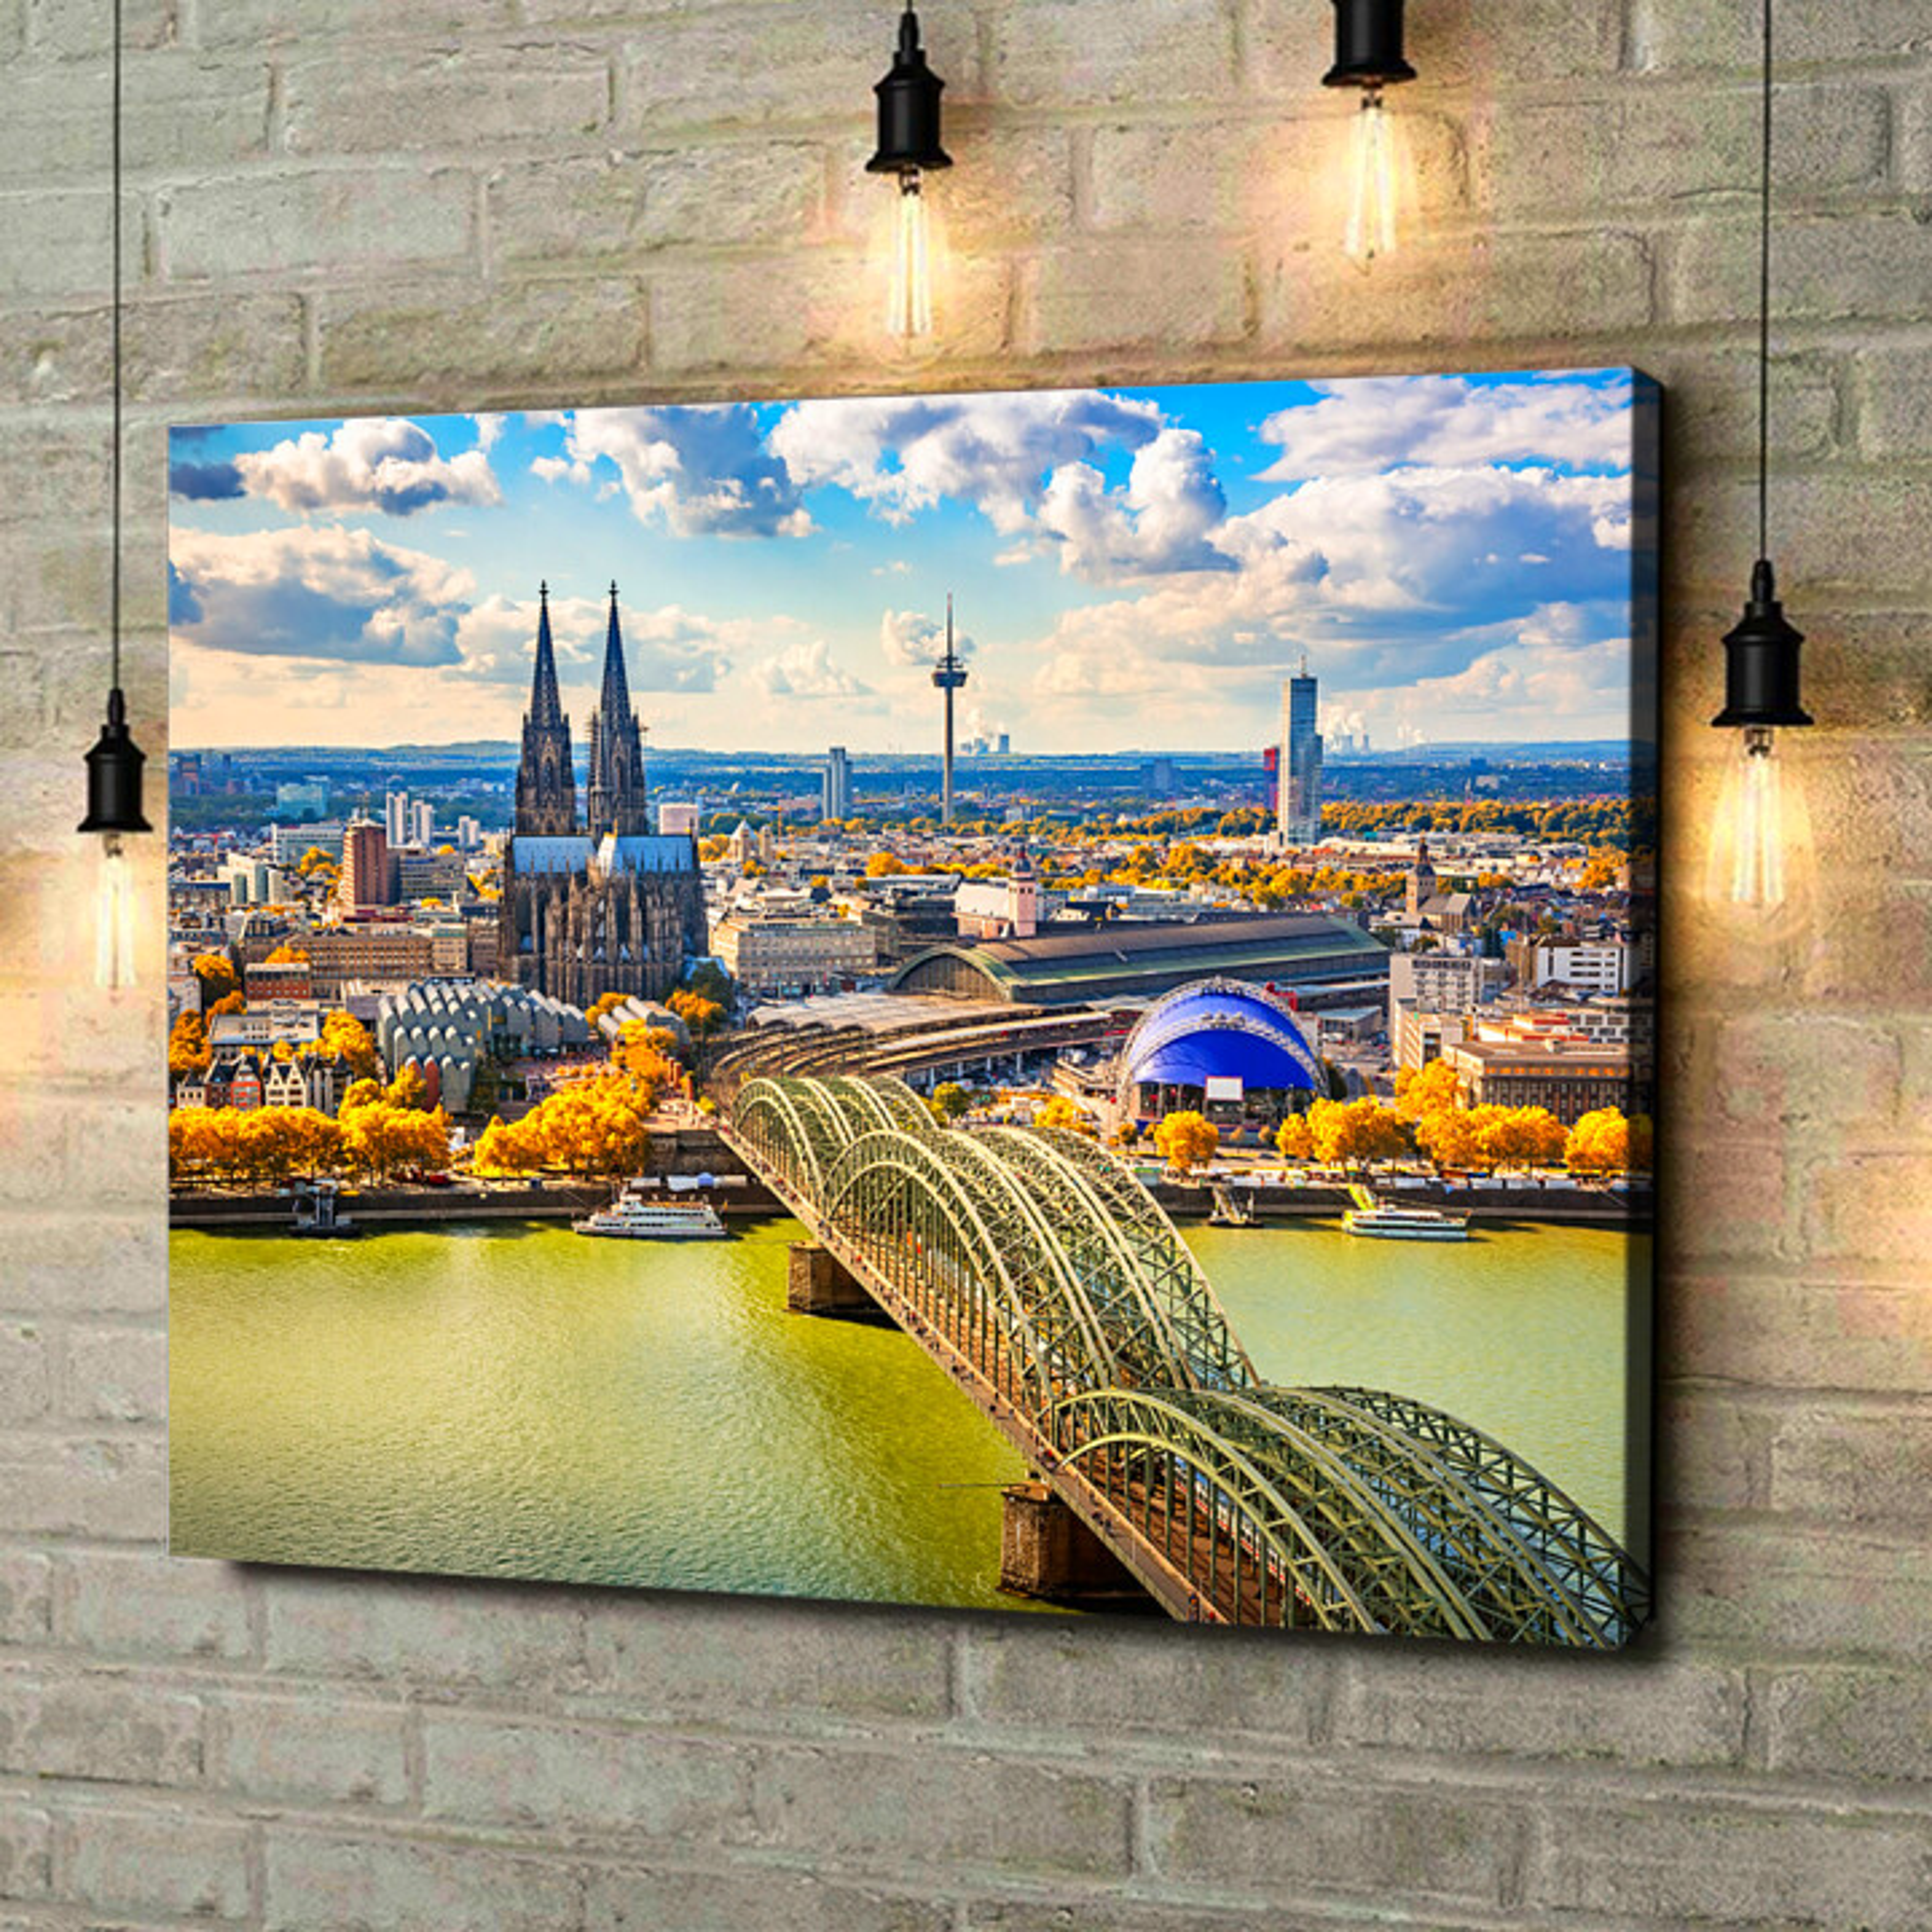 Leinwandbild personalisiert Skyline von Köln